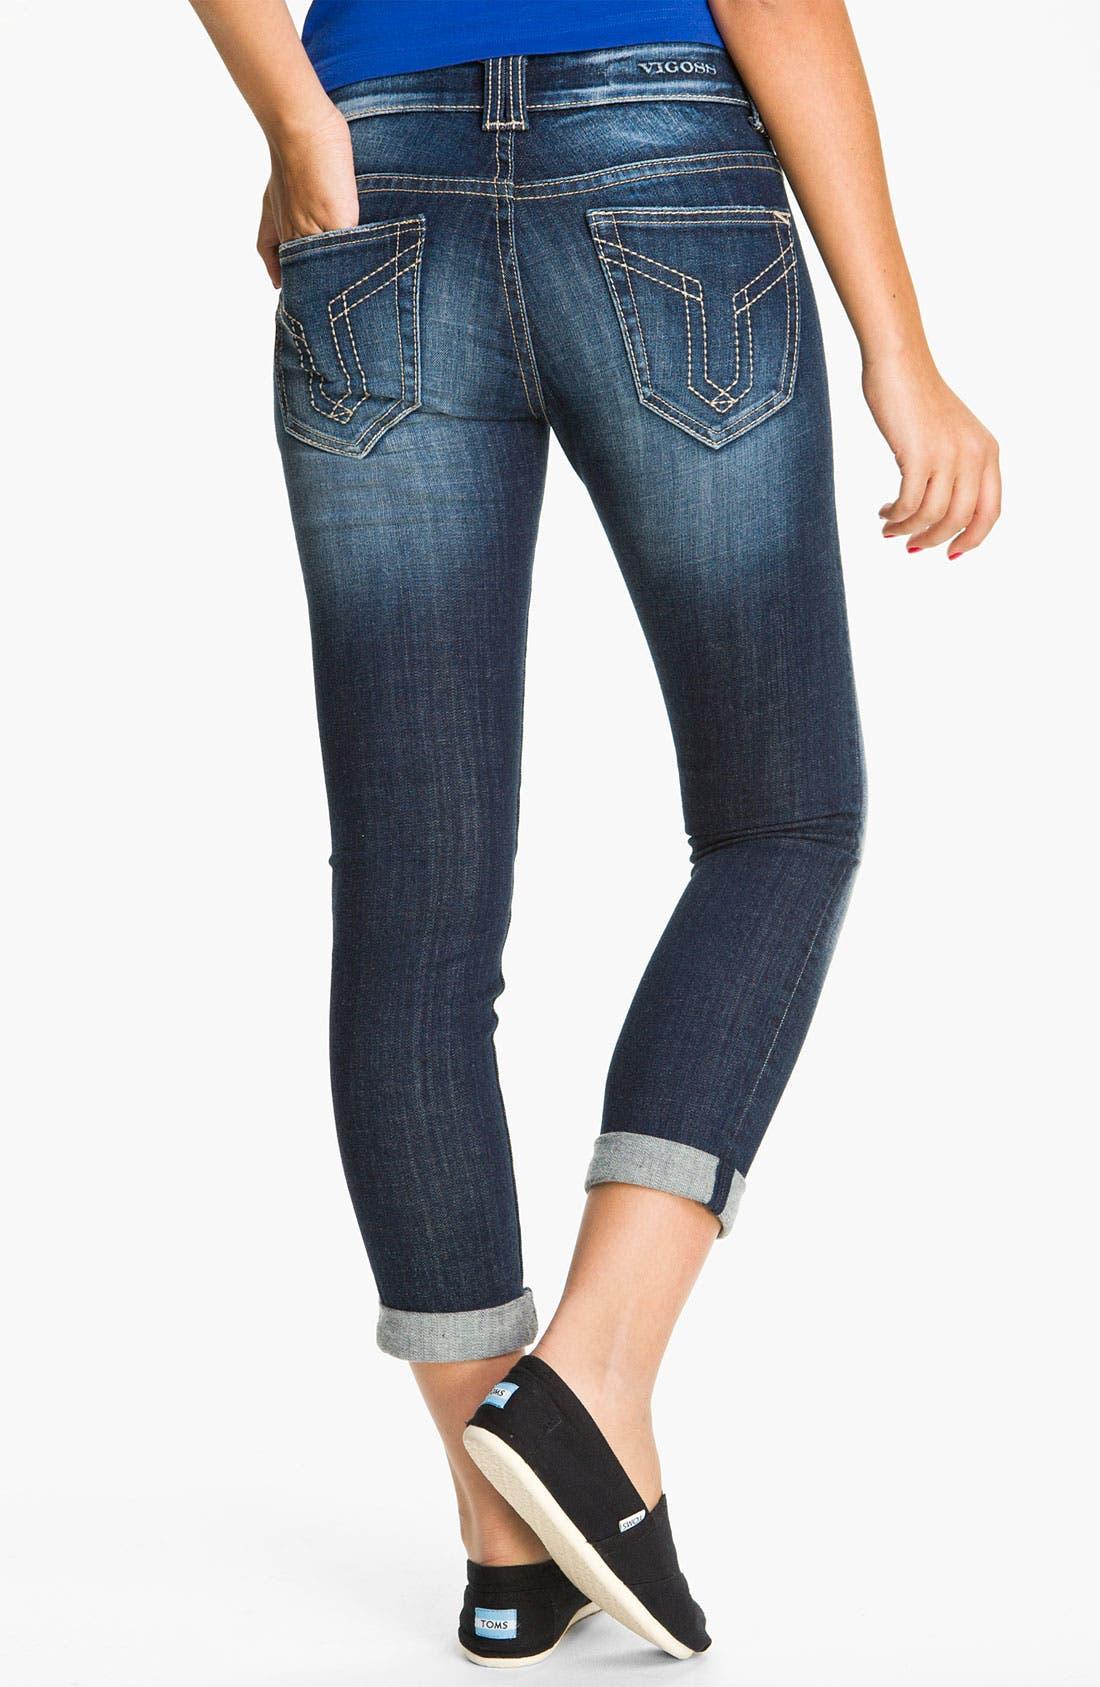 Alternate Image 1 Selected - Vigoss 'Thompson' Stretch Jeans (Dark) (Juniors)